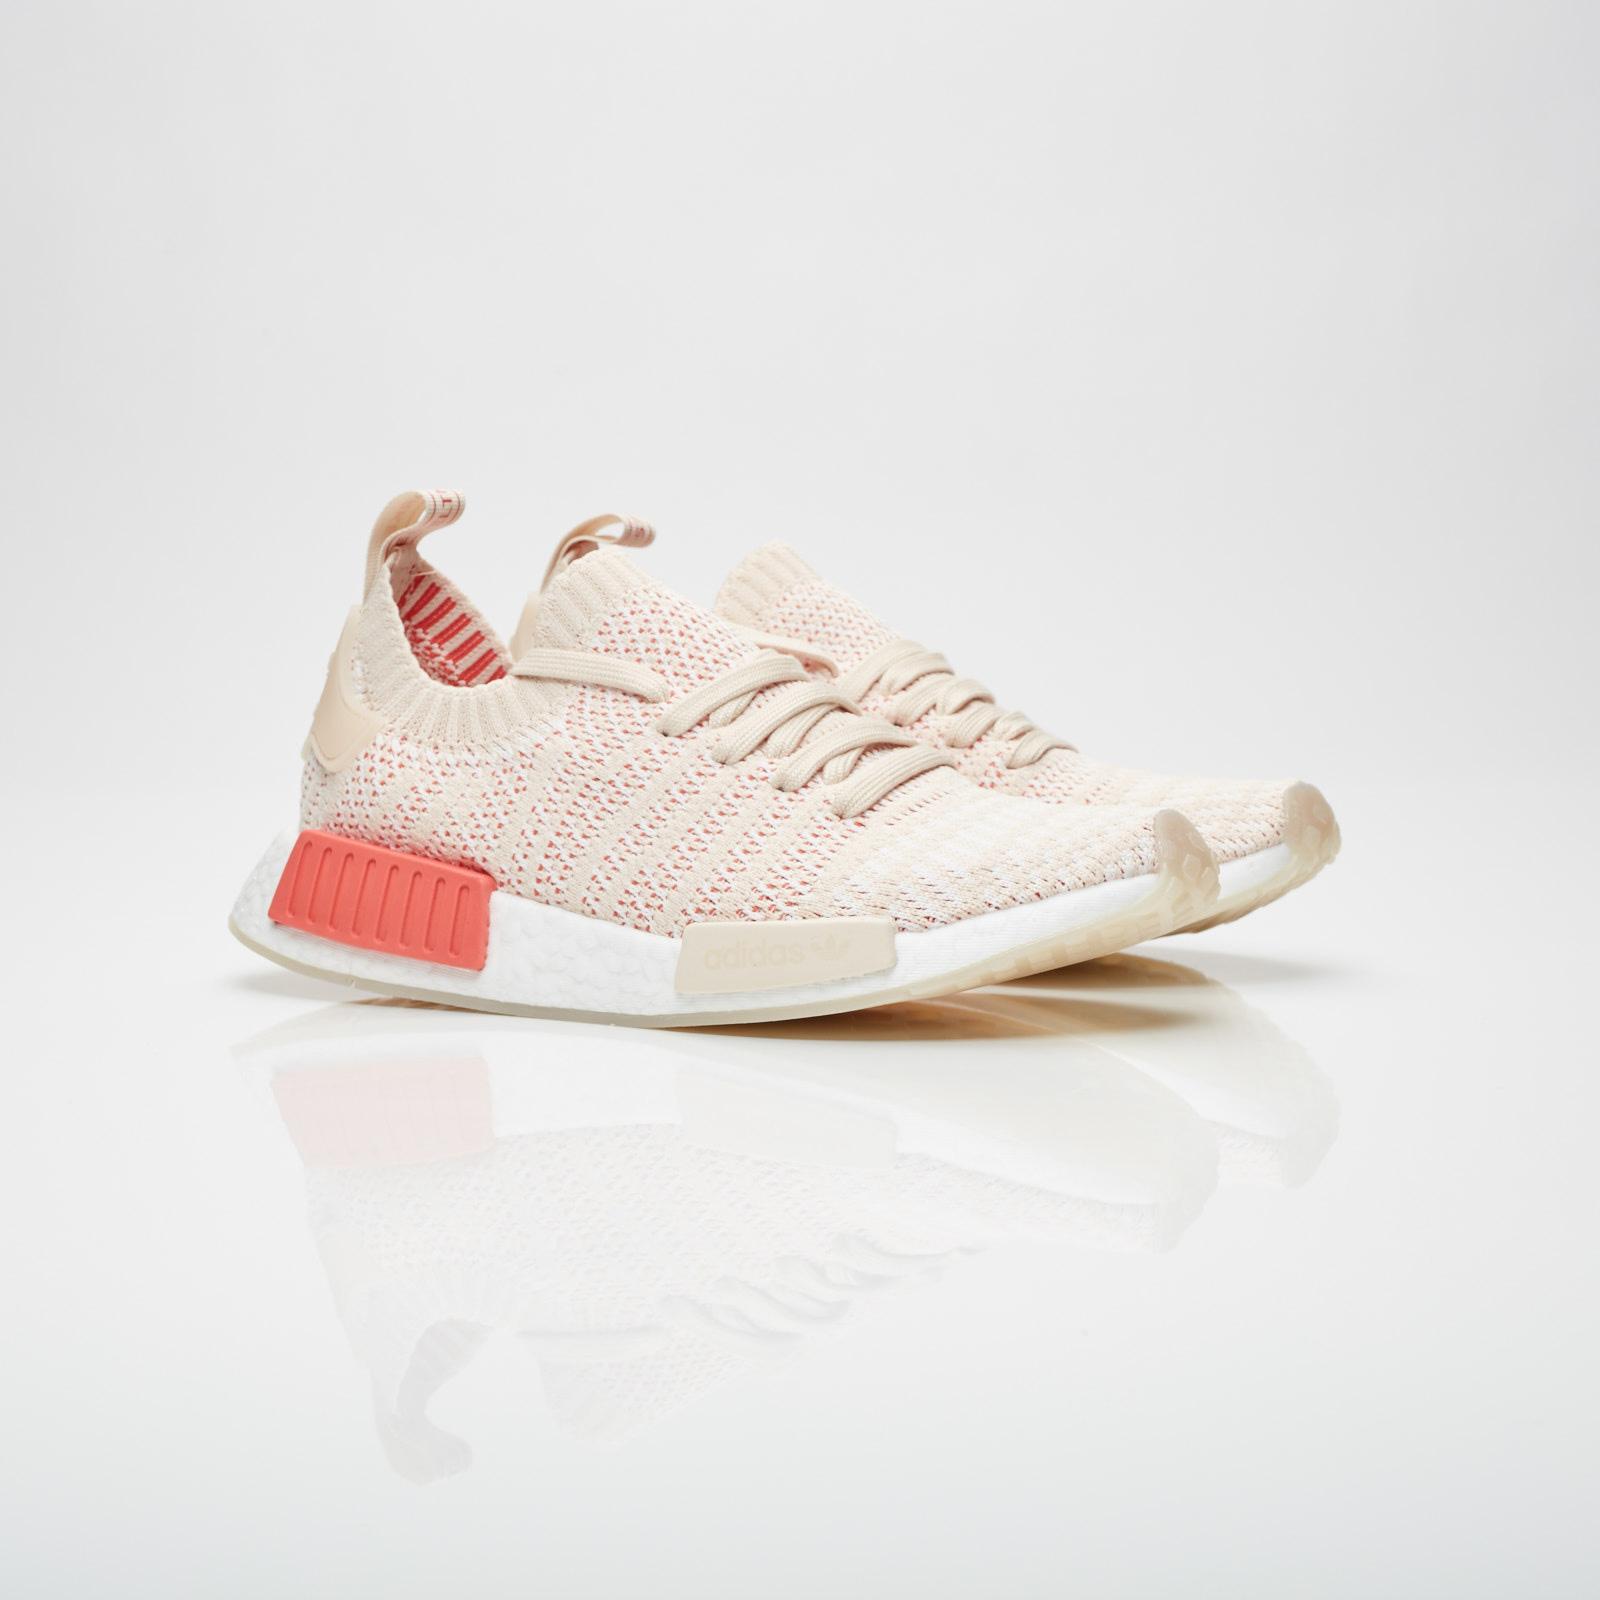 wholesale dealer 97745 14588 adidas NMD R1 Stlt PK W - Cq2030 - Sneakersnstuff | sneakers ...